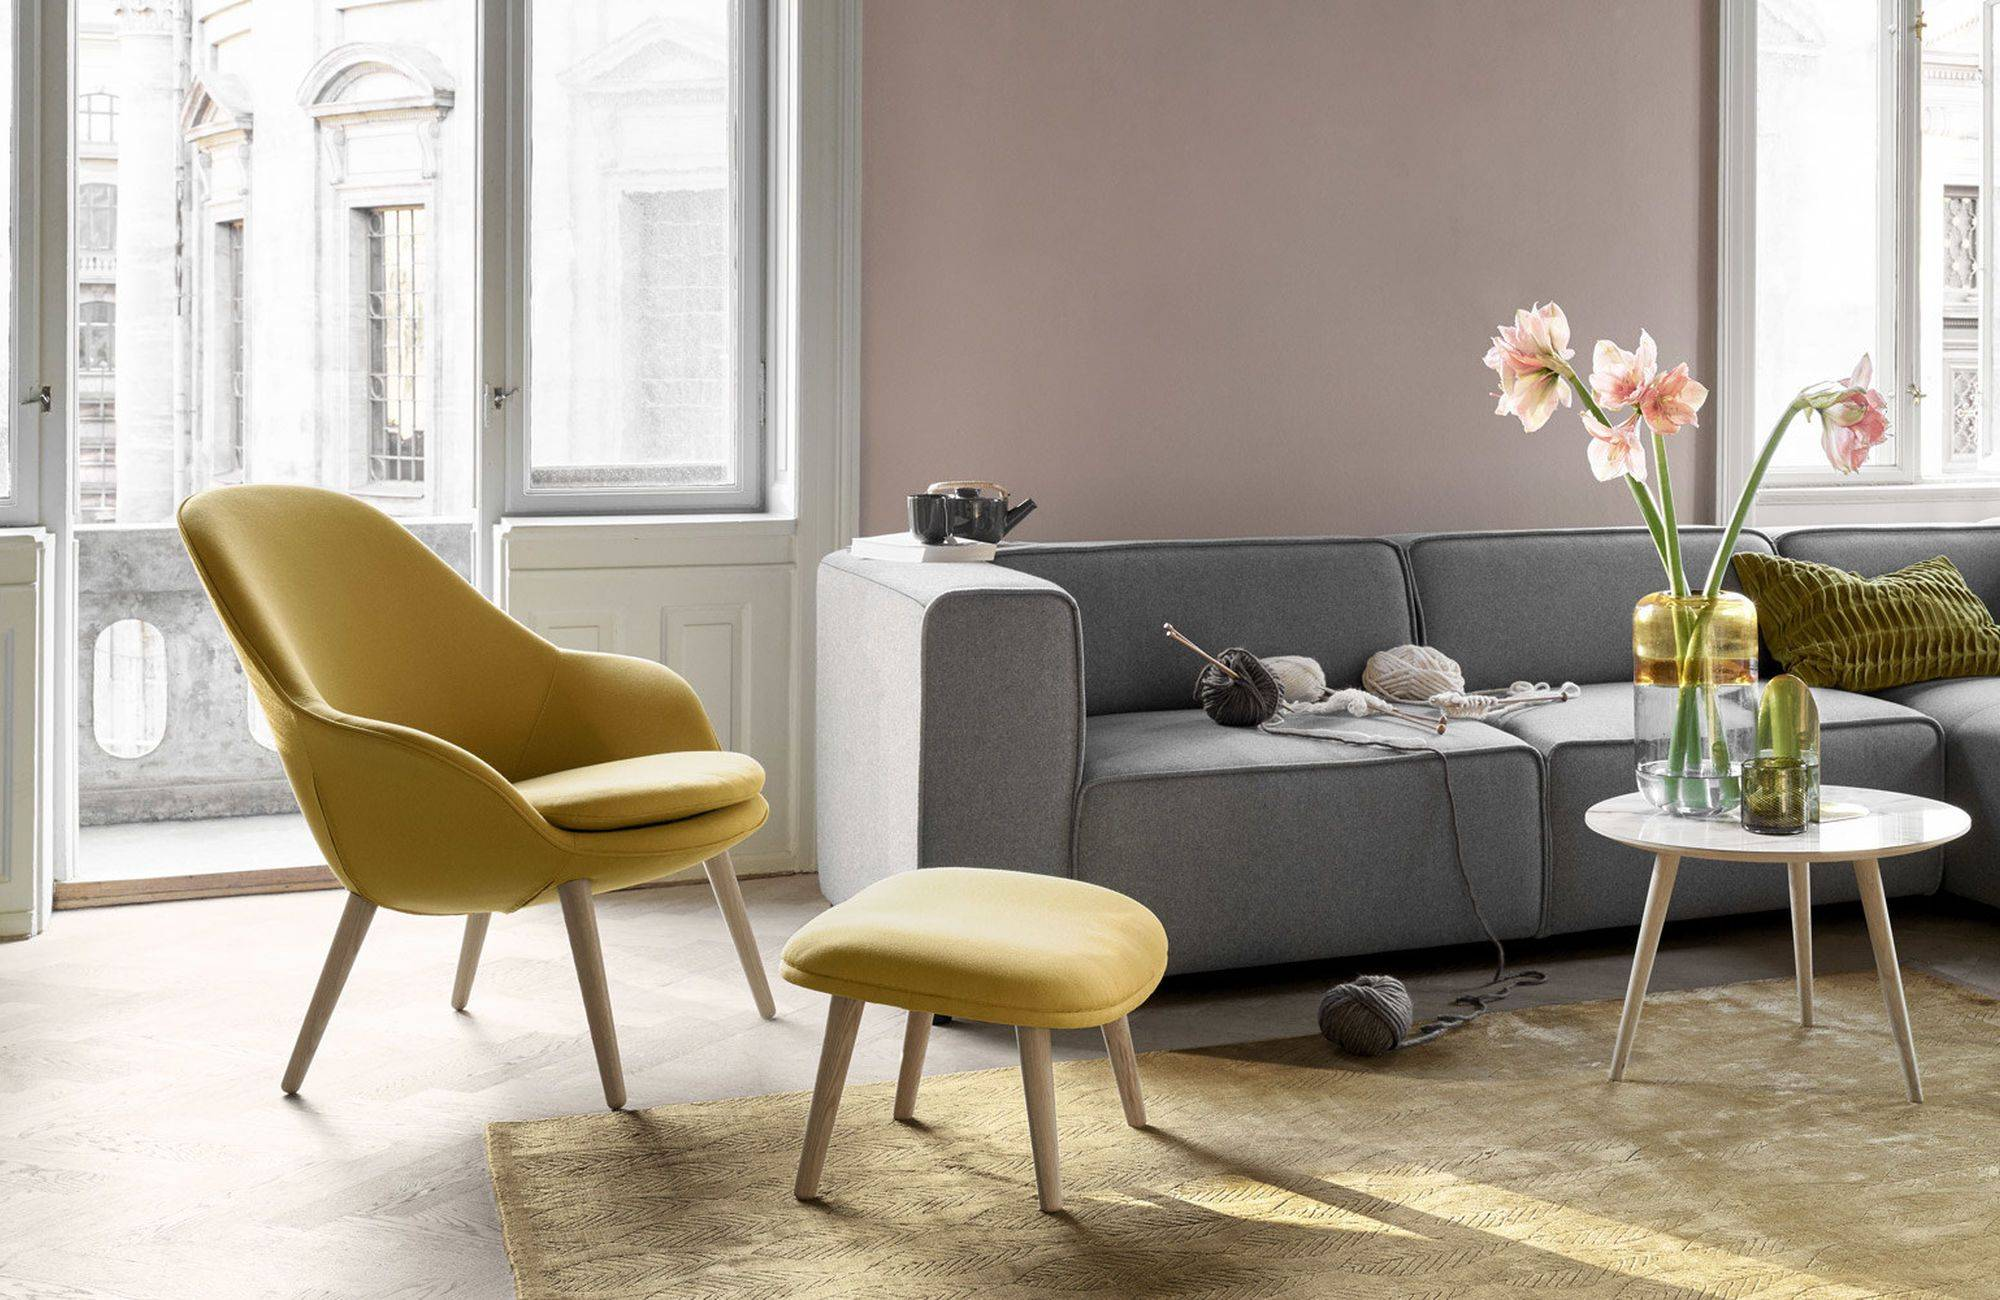 wohnzimmer deko dunkelgrun inspirational armchairs adelaide living chair boconcept of wohnzimmer deko dunkelgrun